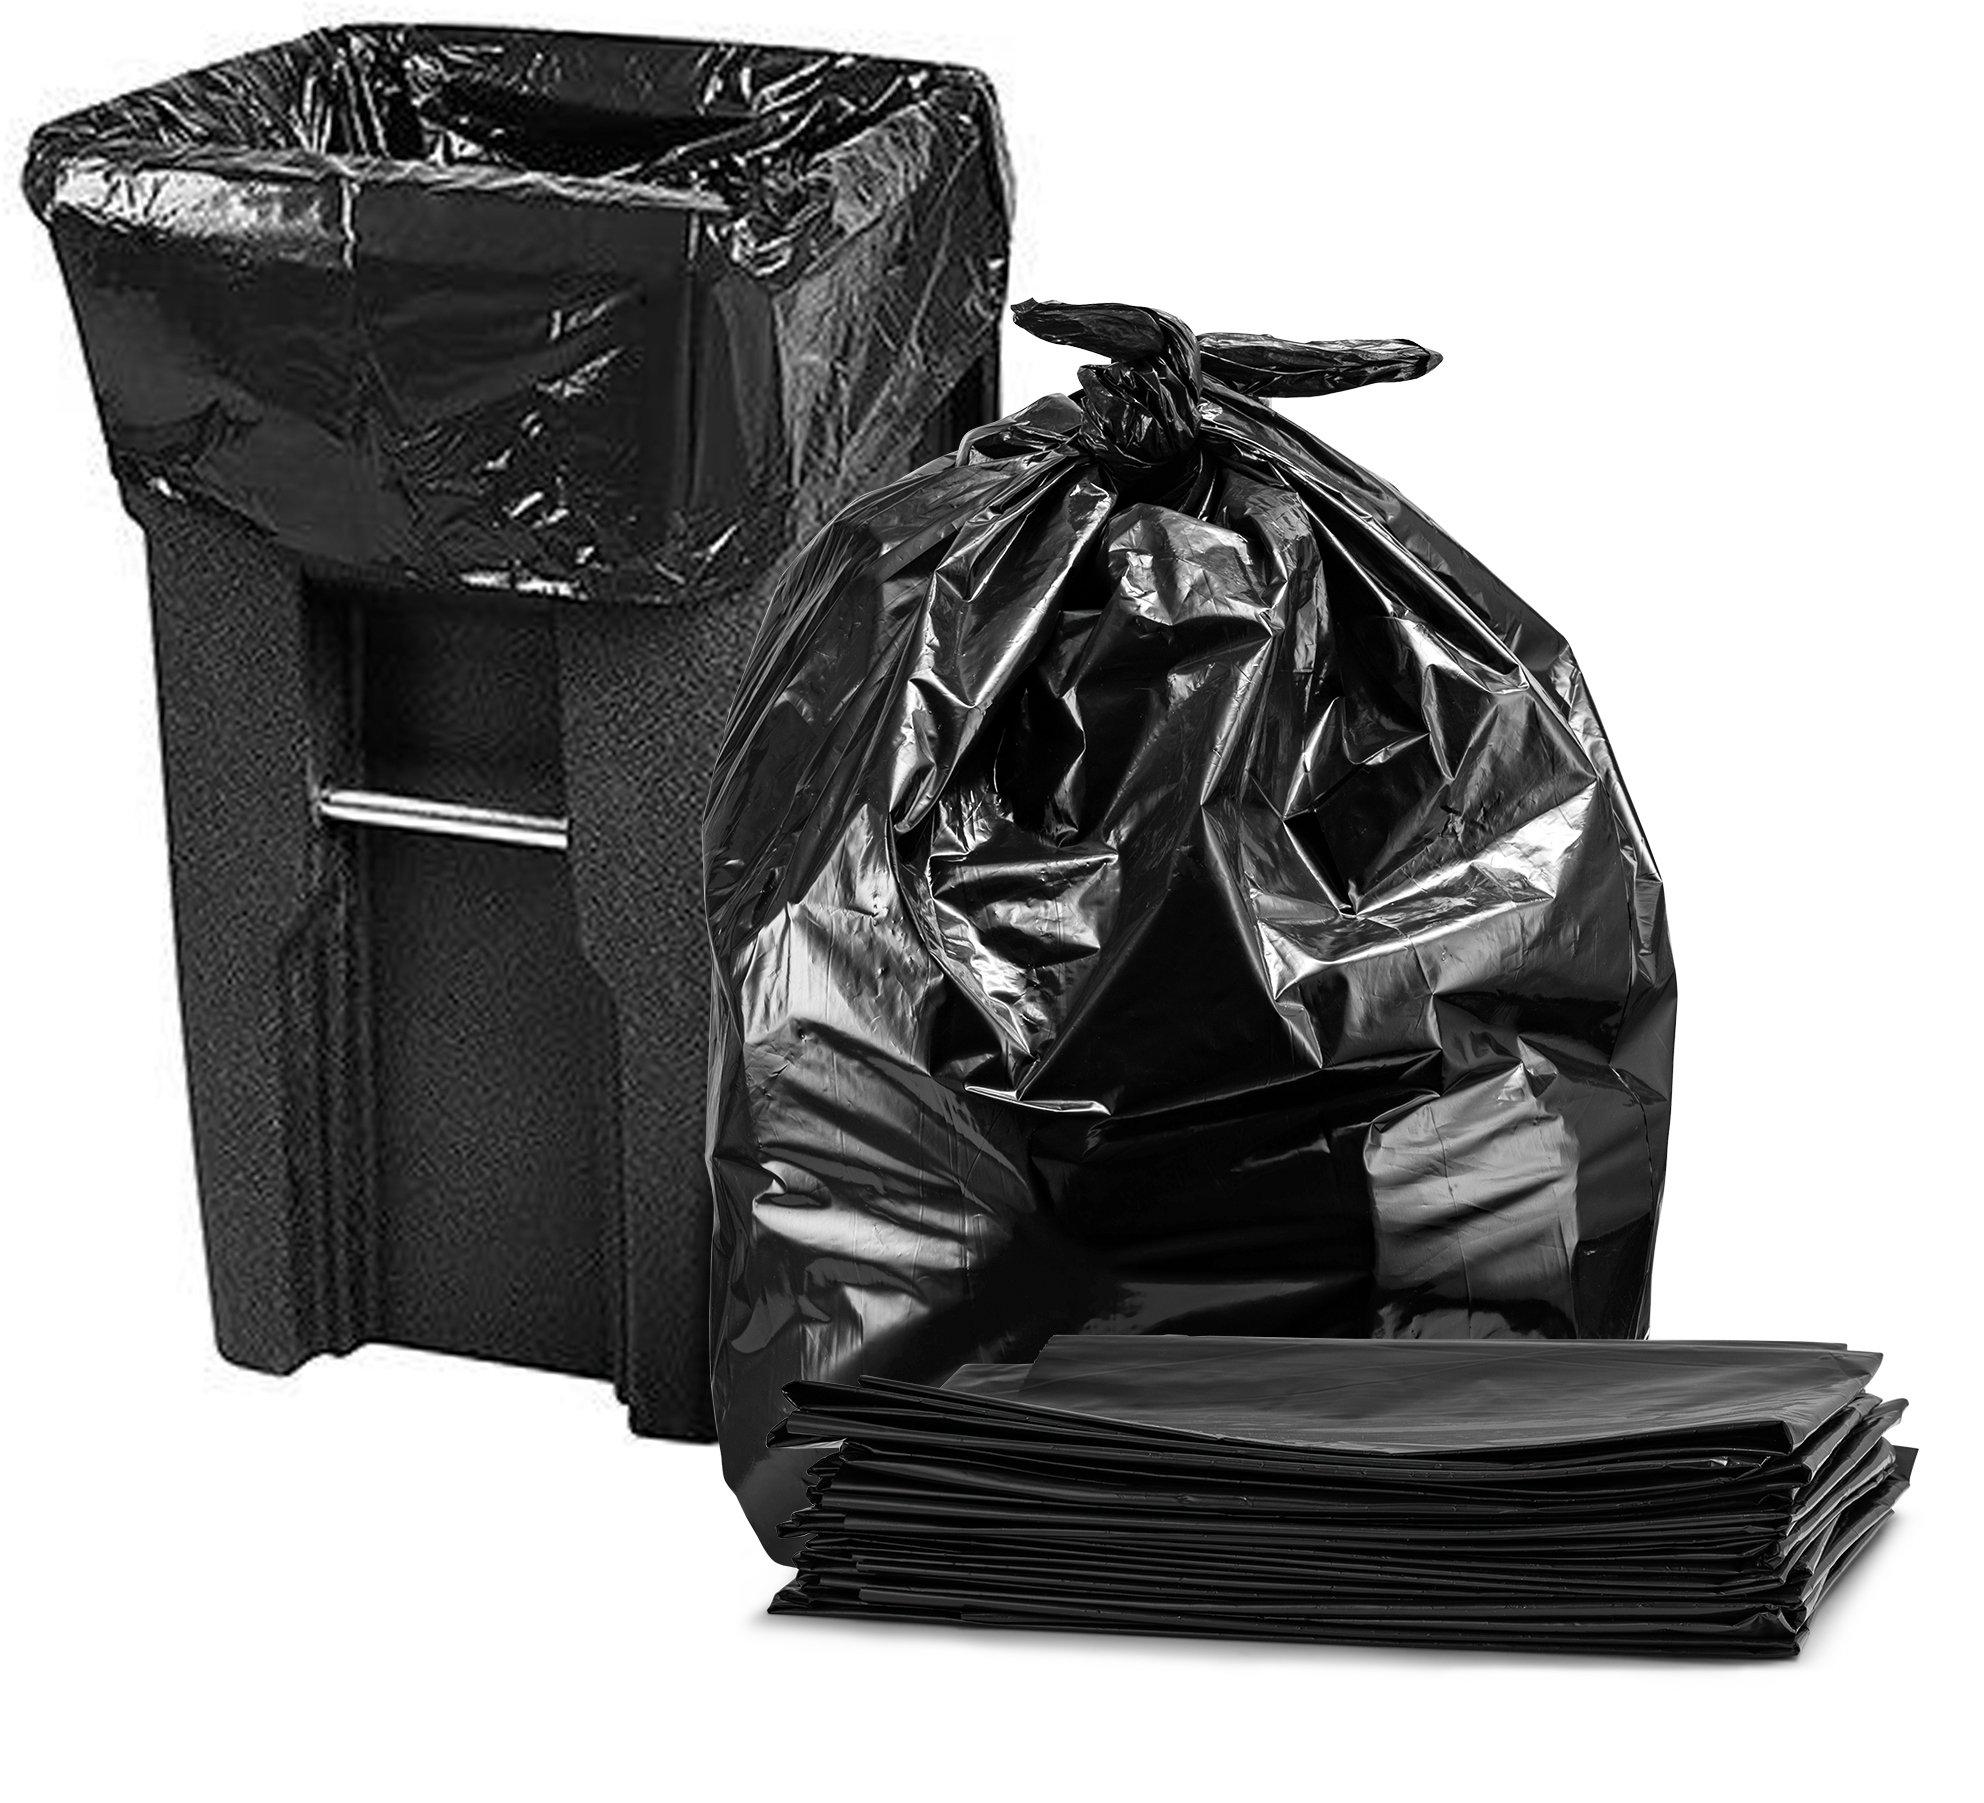 95-100 Gallon (50/Count Wholesale) Large Black Trash Bags, Super Value Pack, (Black) by Tasker